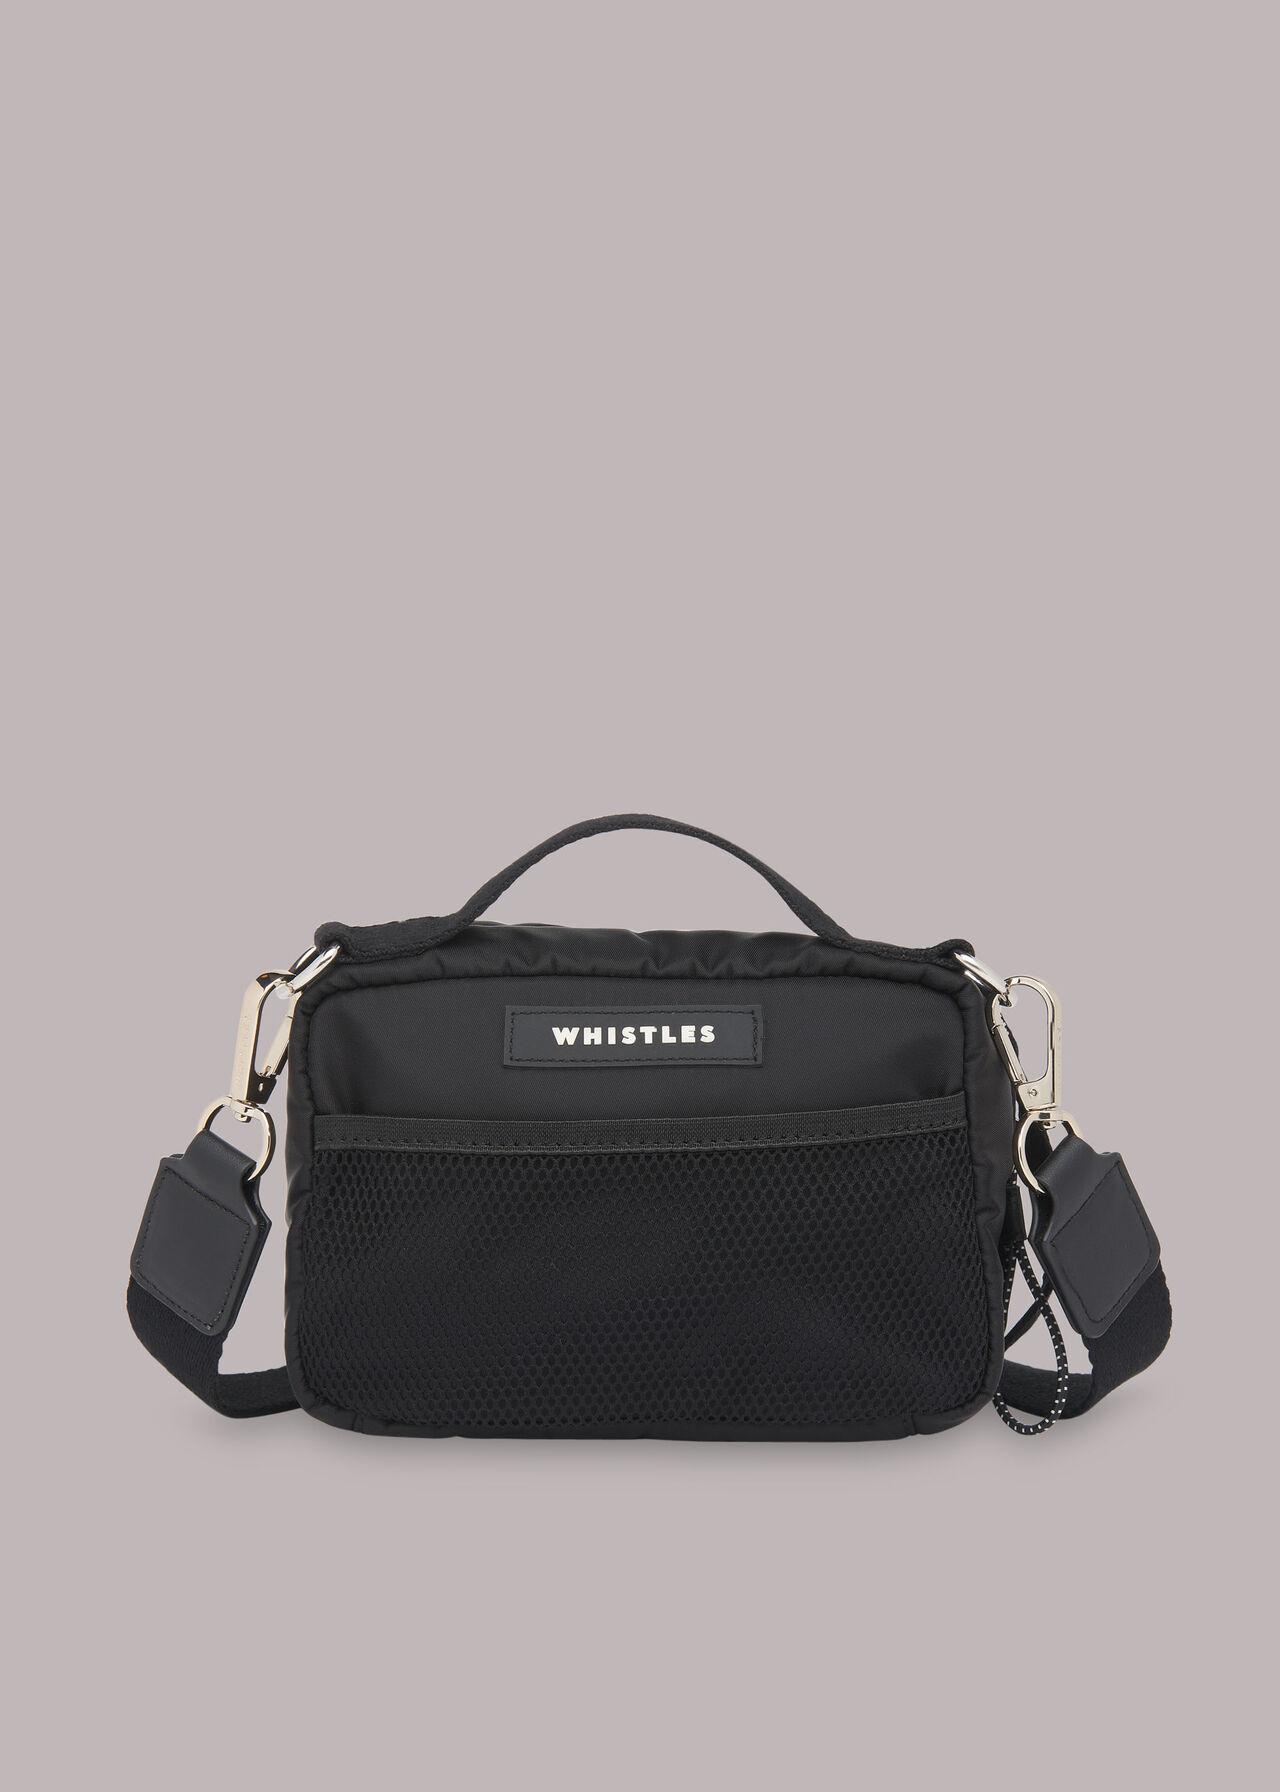 Reilly Nylon Crossbody Bag